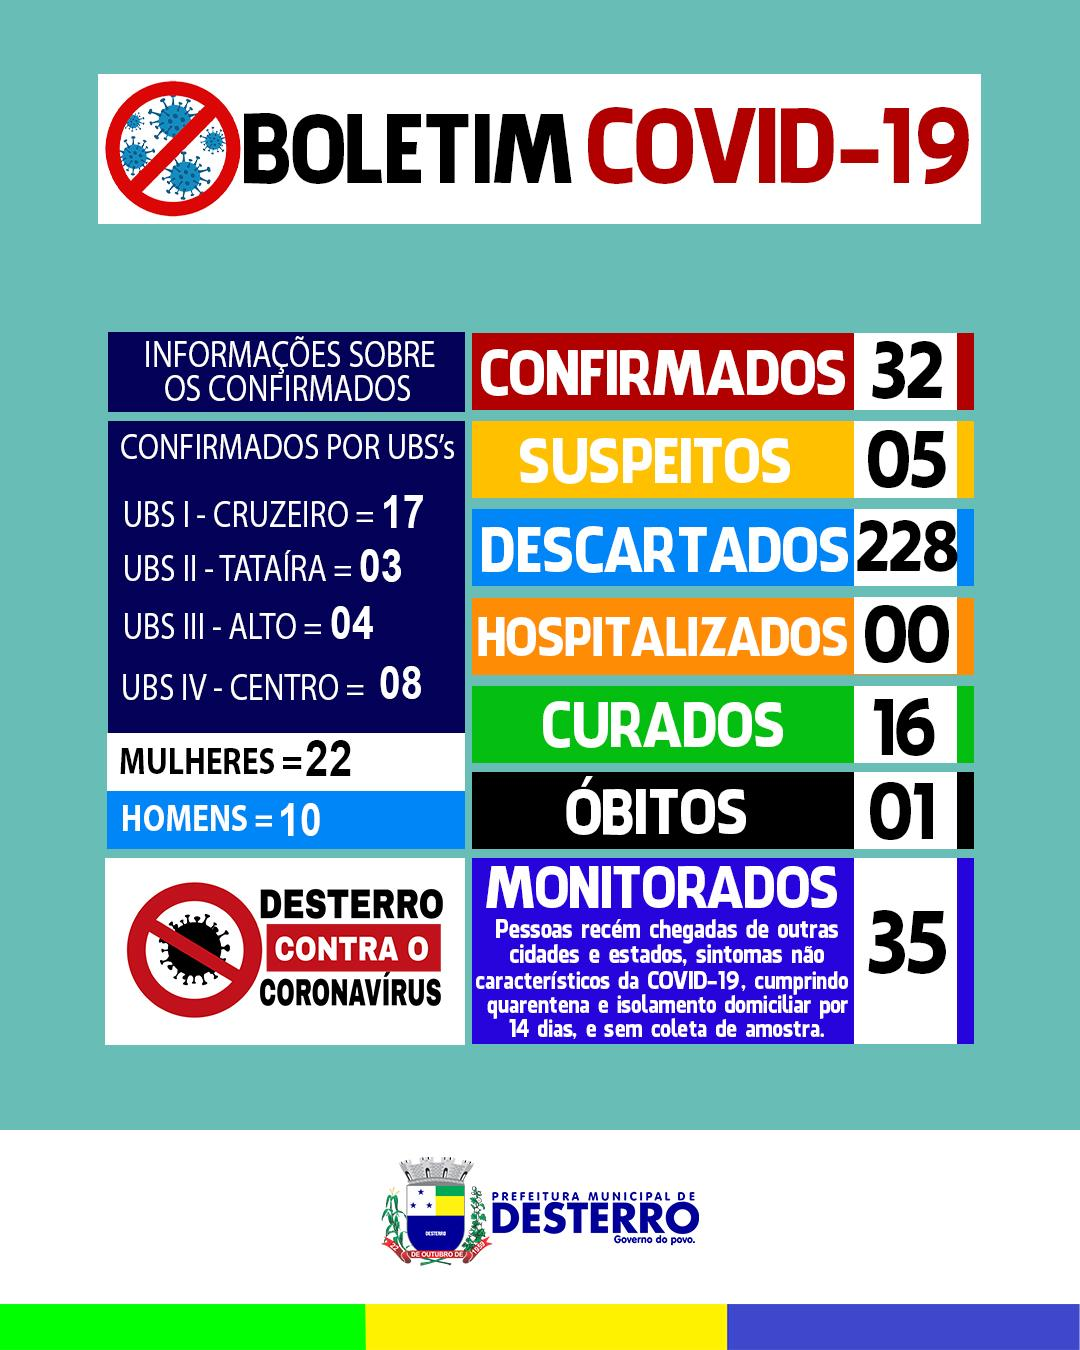 Boletim Covid-19 (26/06/2020)